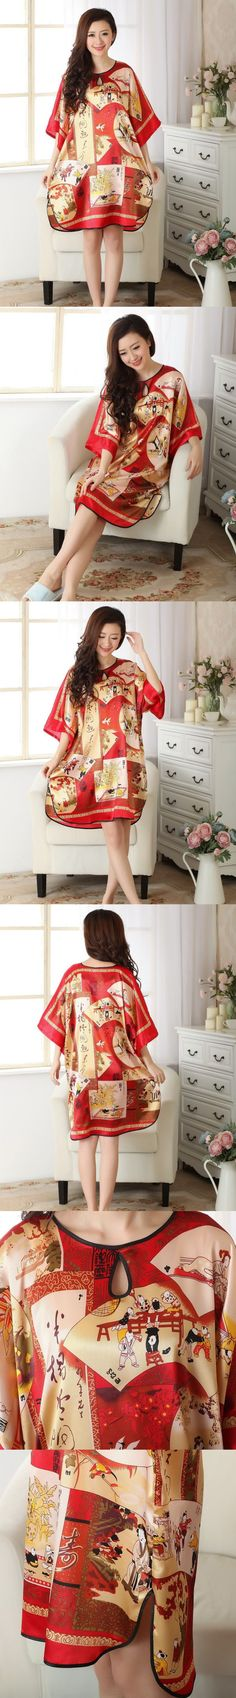 Plus Size 4XL Red Chinese Style Women Silk Rayon Robe Summer Lounge Sleepwear Home Dress Robe Gown Yukata Nightshirt S0107-A